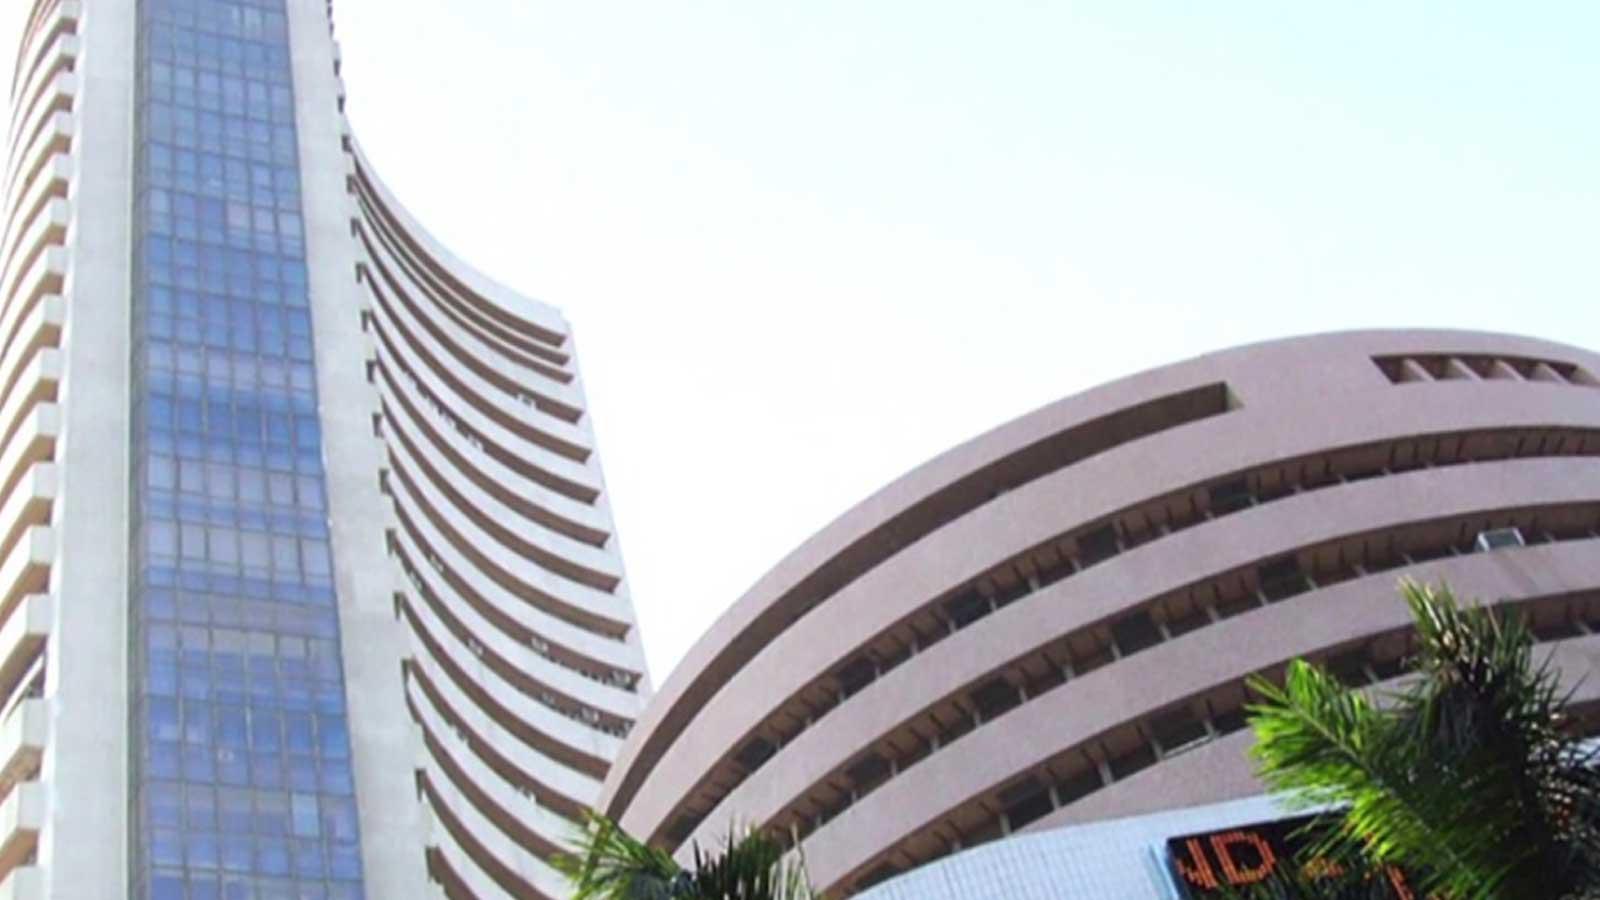 indian-markets-closed-on-account-of-mahavir-jayanti-asian-shares-rise